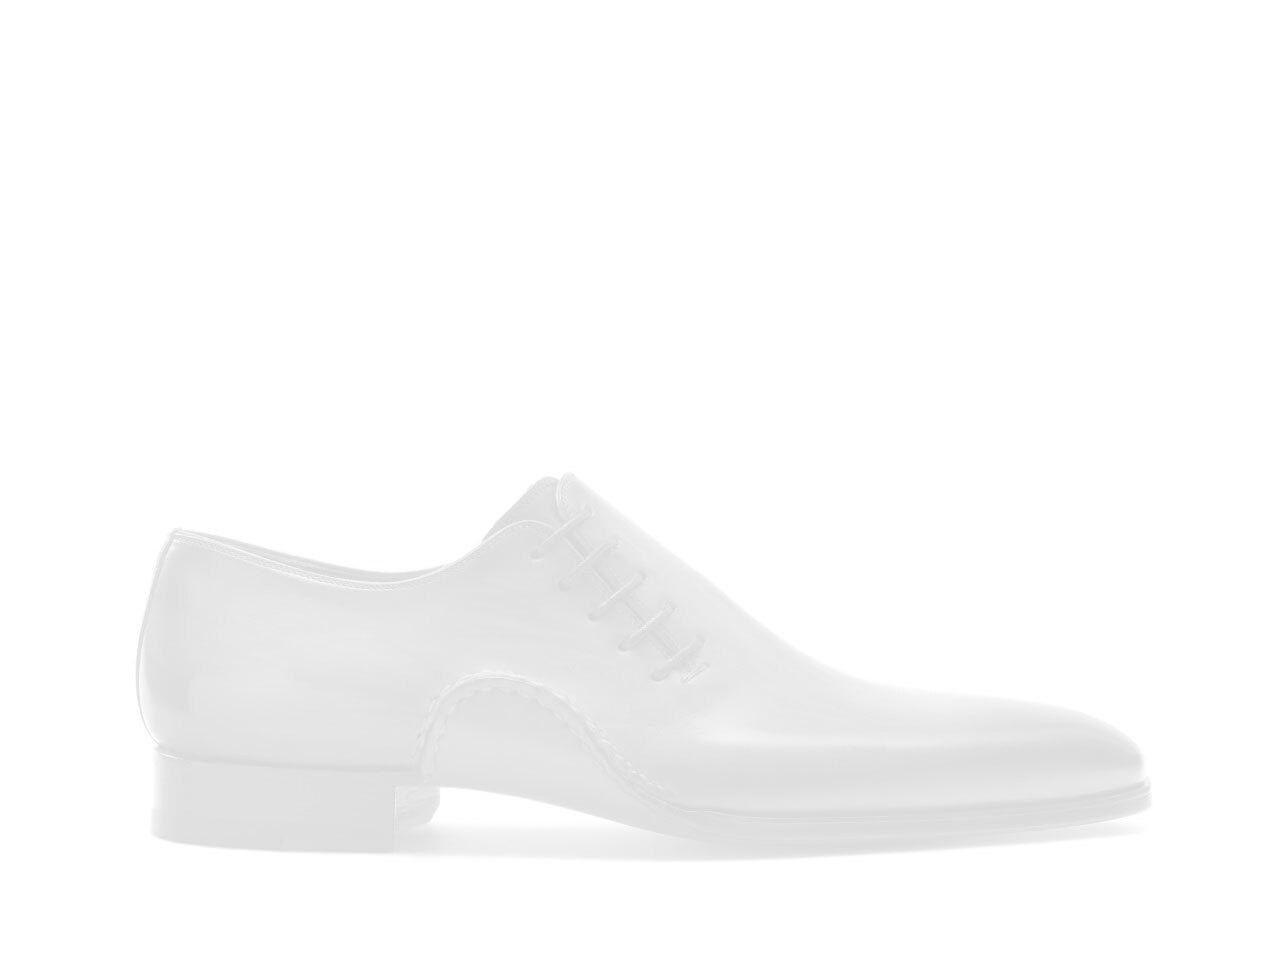 Mali Cognac Men's Loafer Shoes